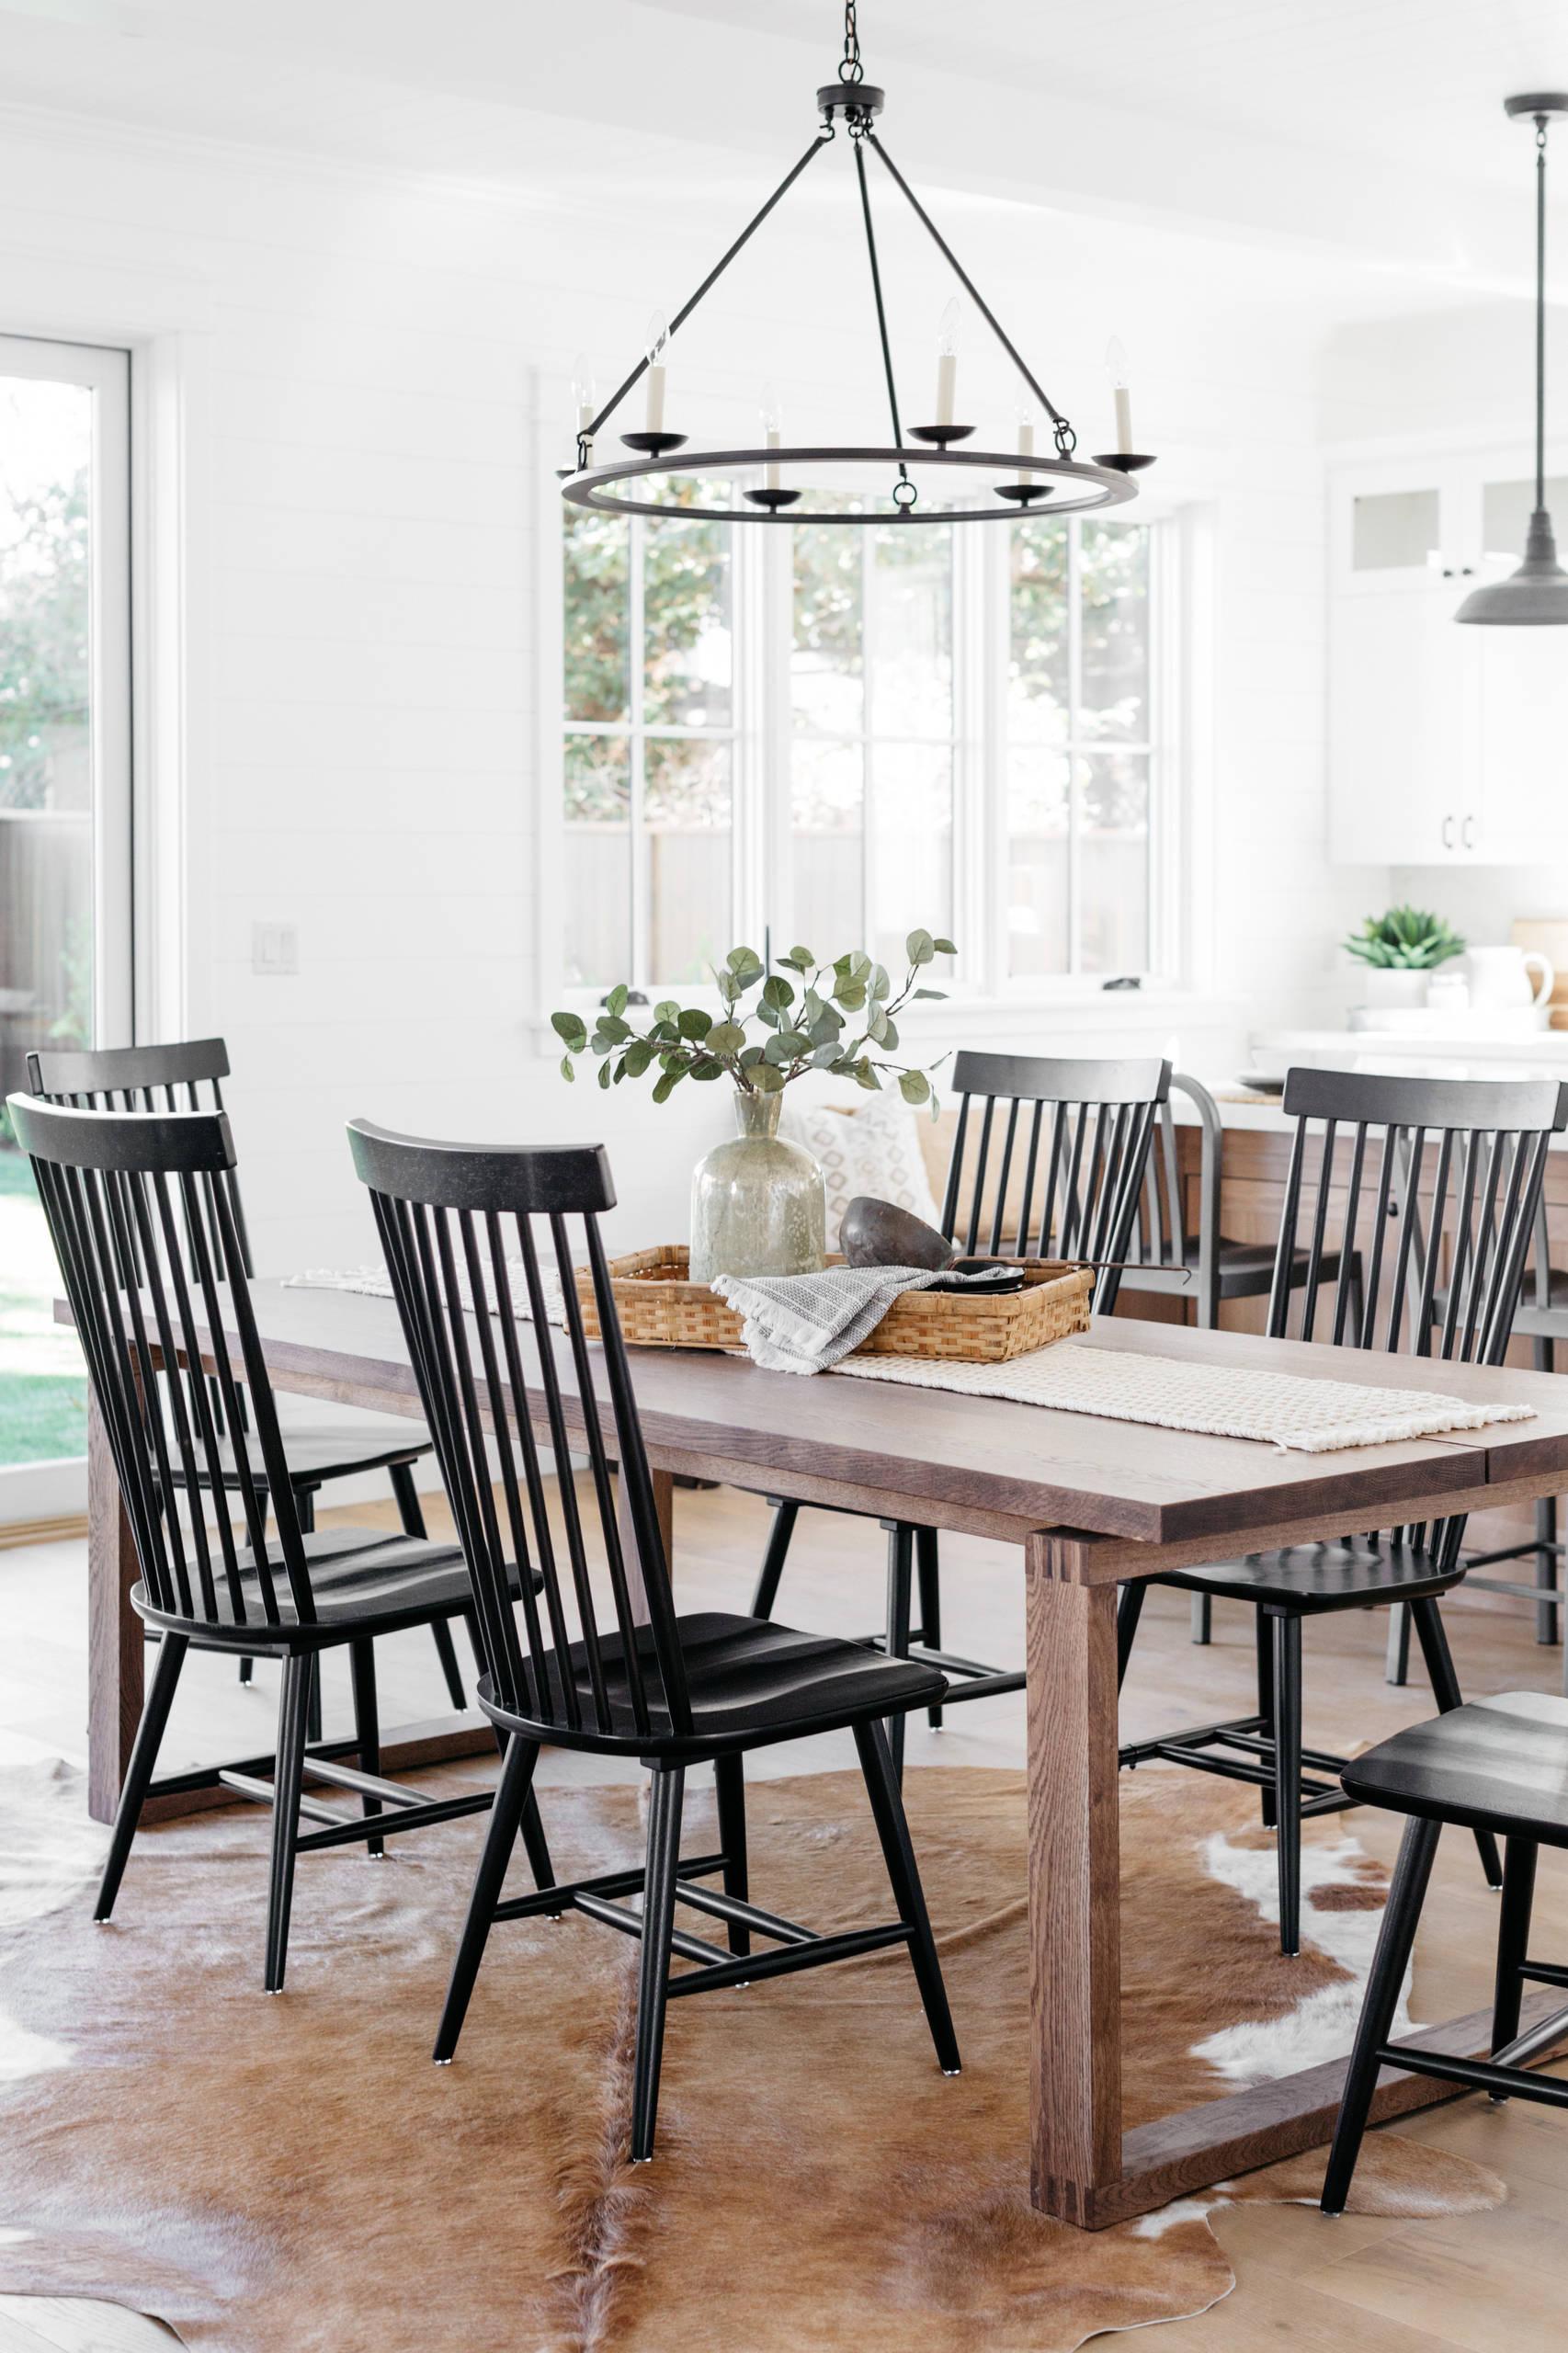 Black Windsor Chairs In Urban Farmhouse, Urban Farmhouse Dining Room Light